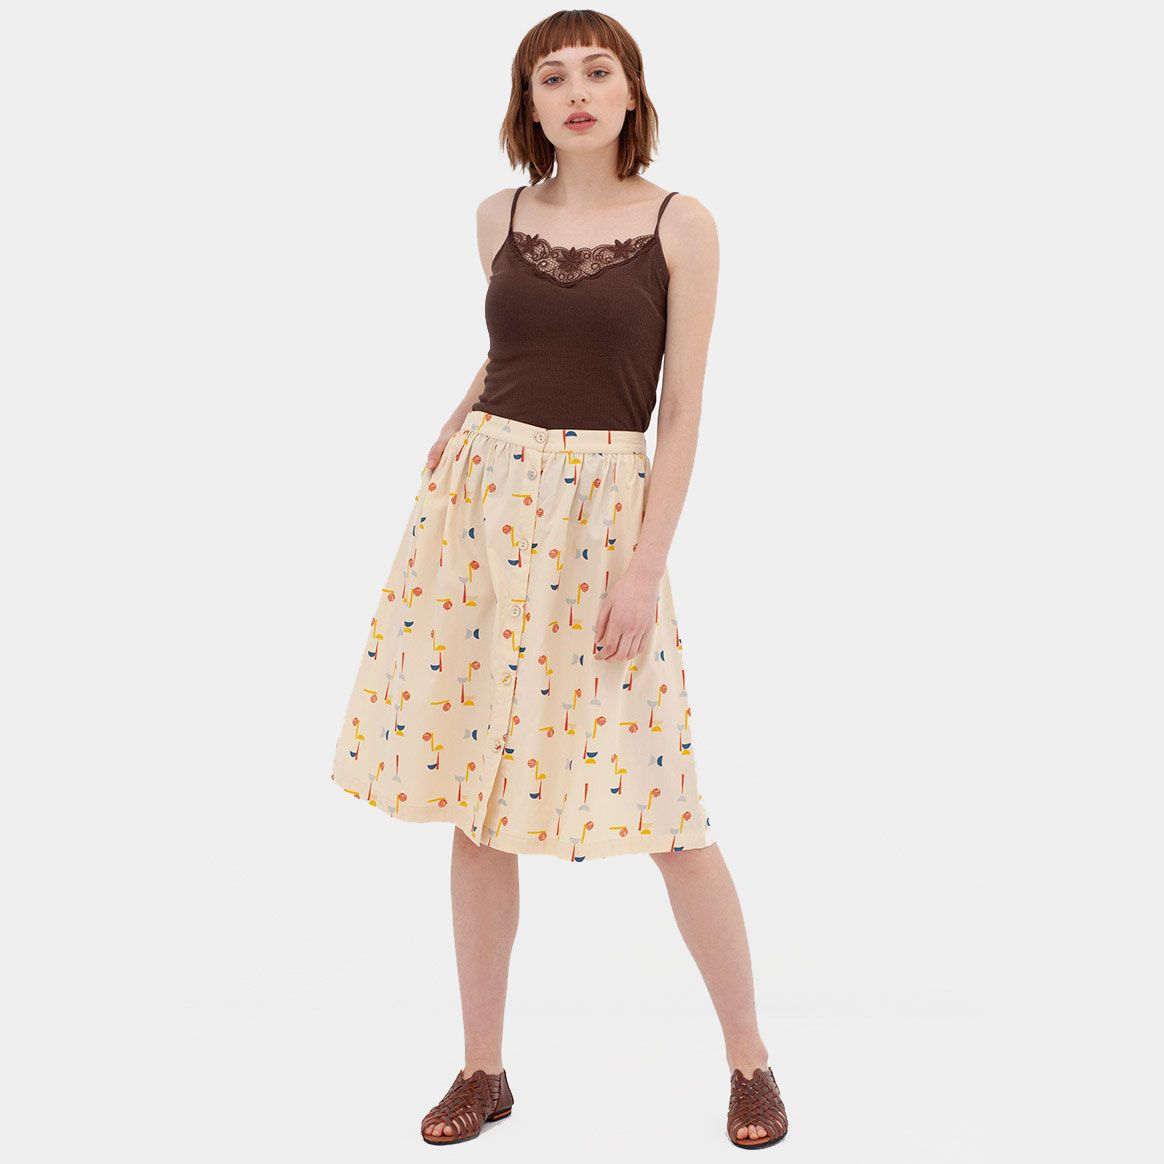 Falda midi de algodón orgánico estampada